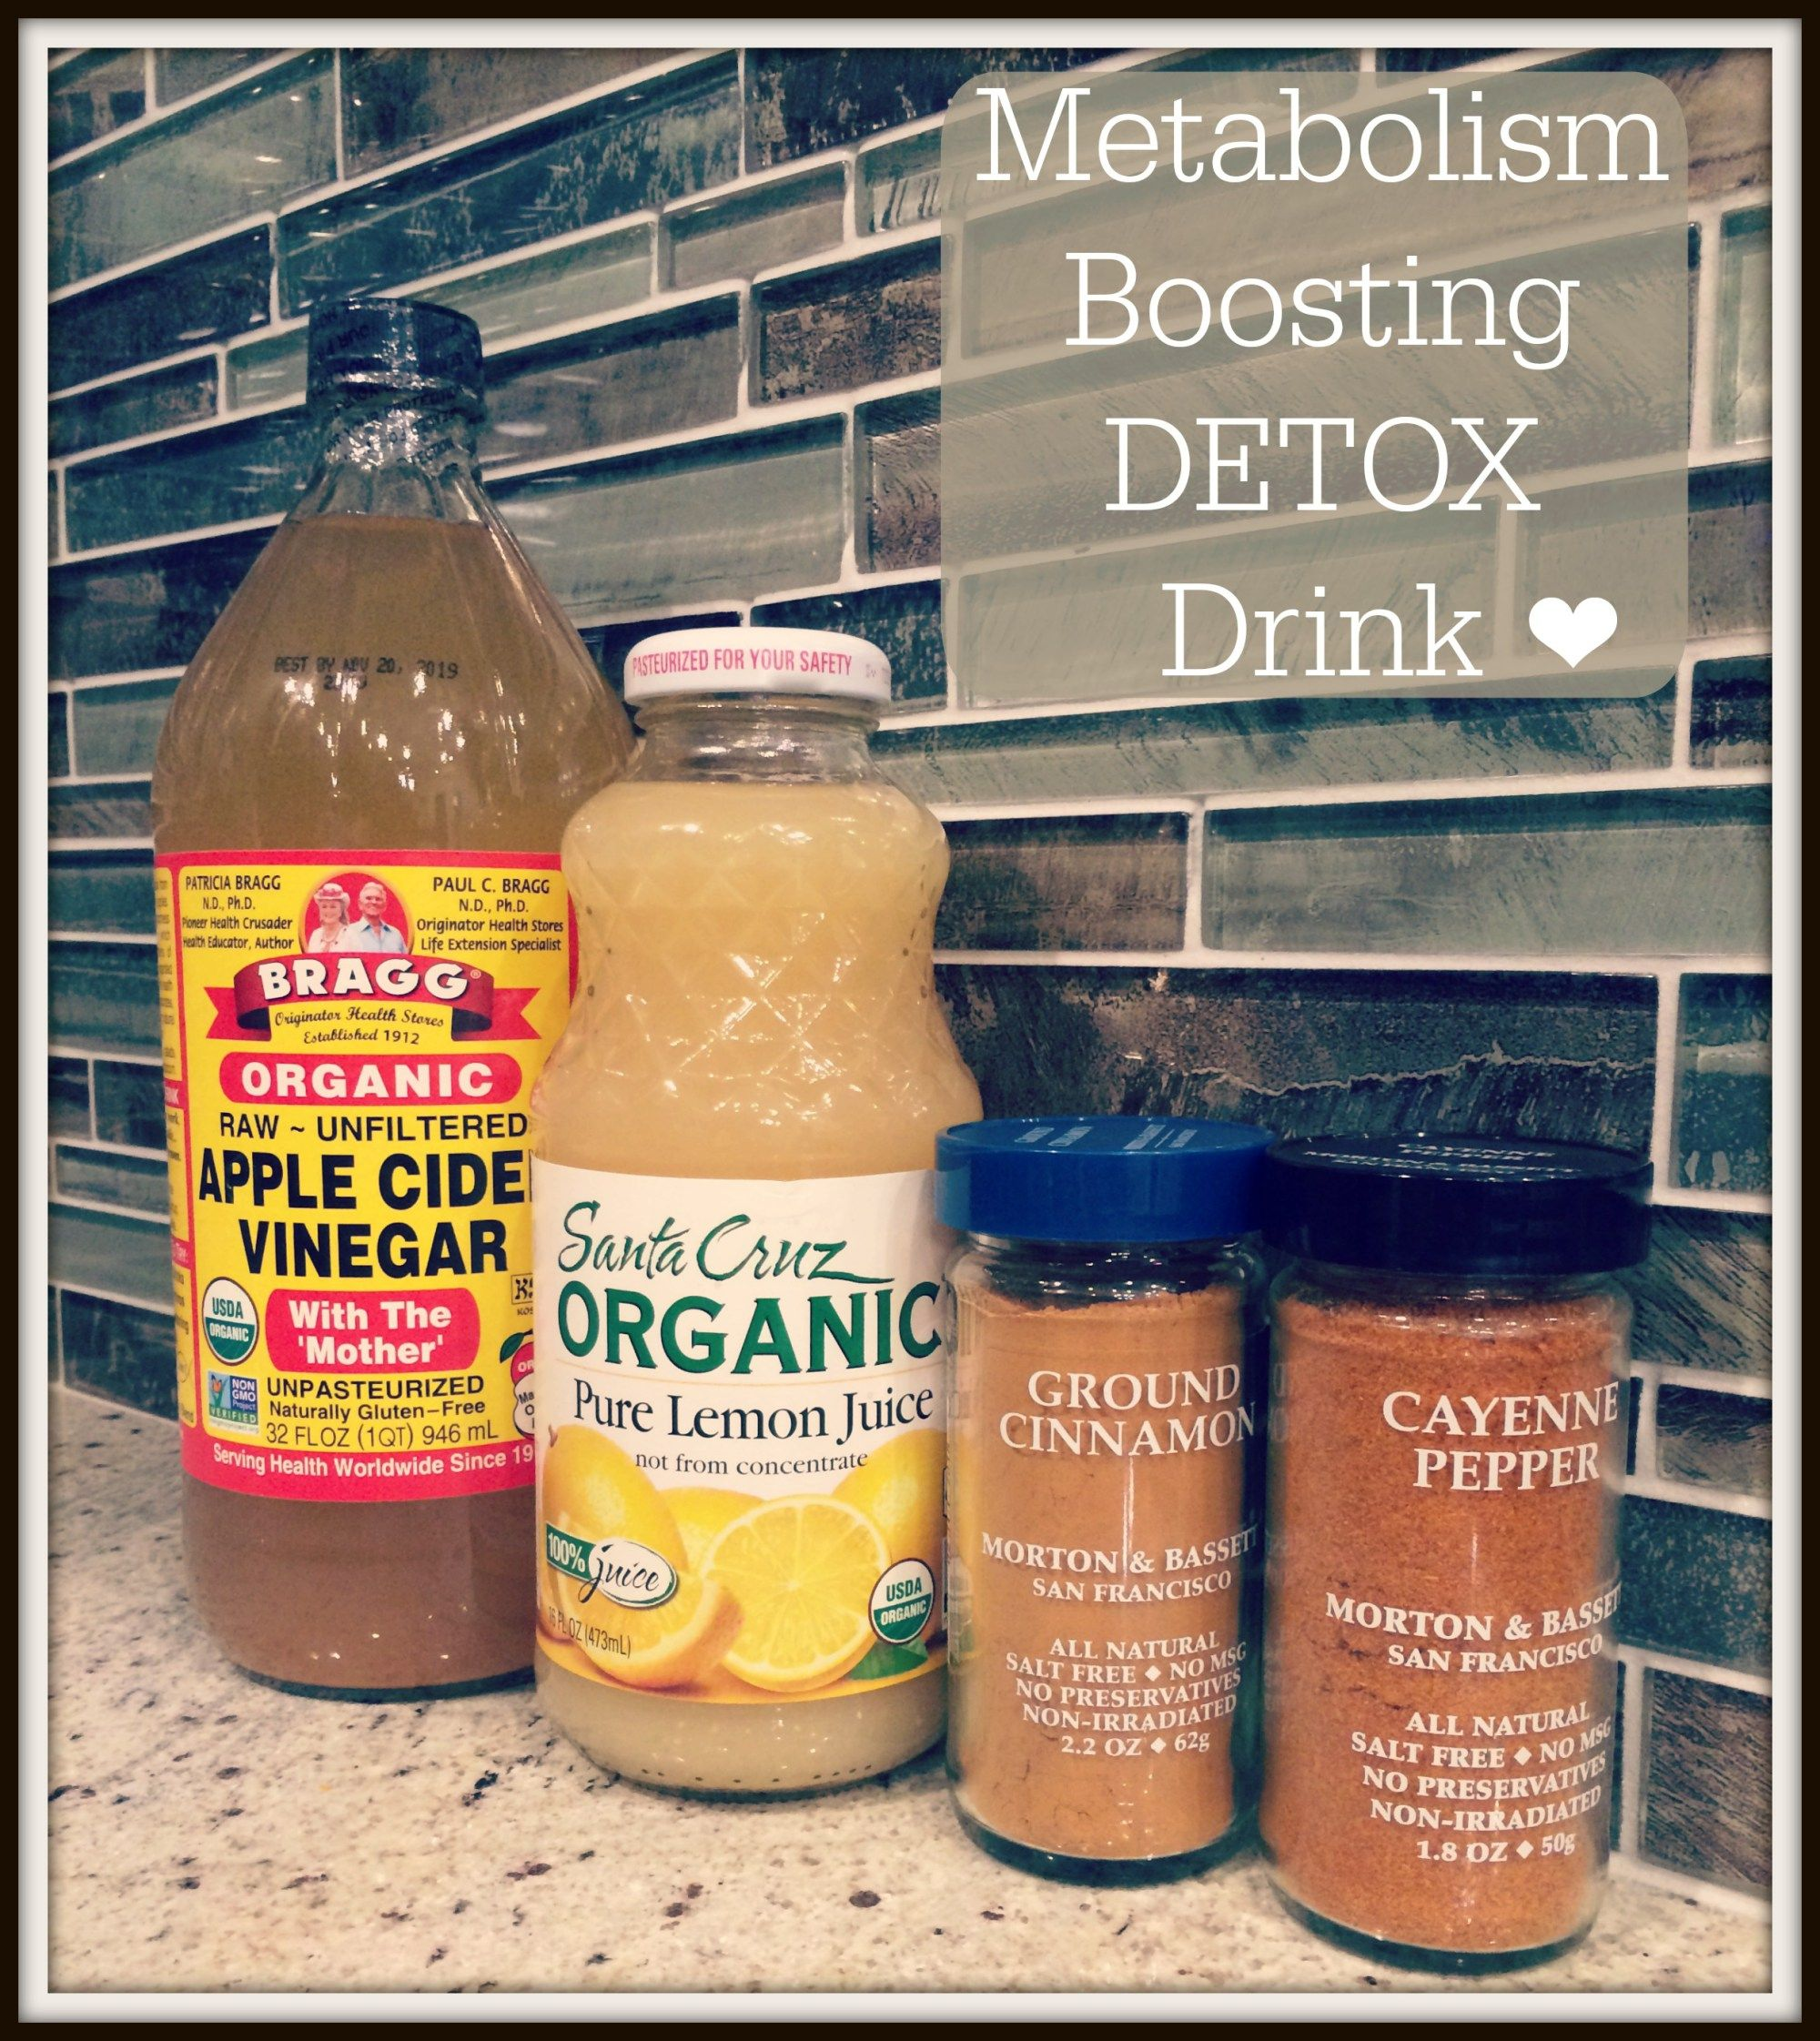 Metabolism Boosting Detox Drink 2